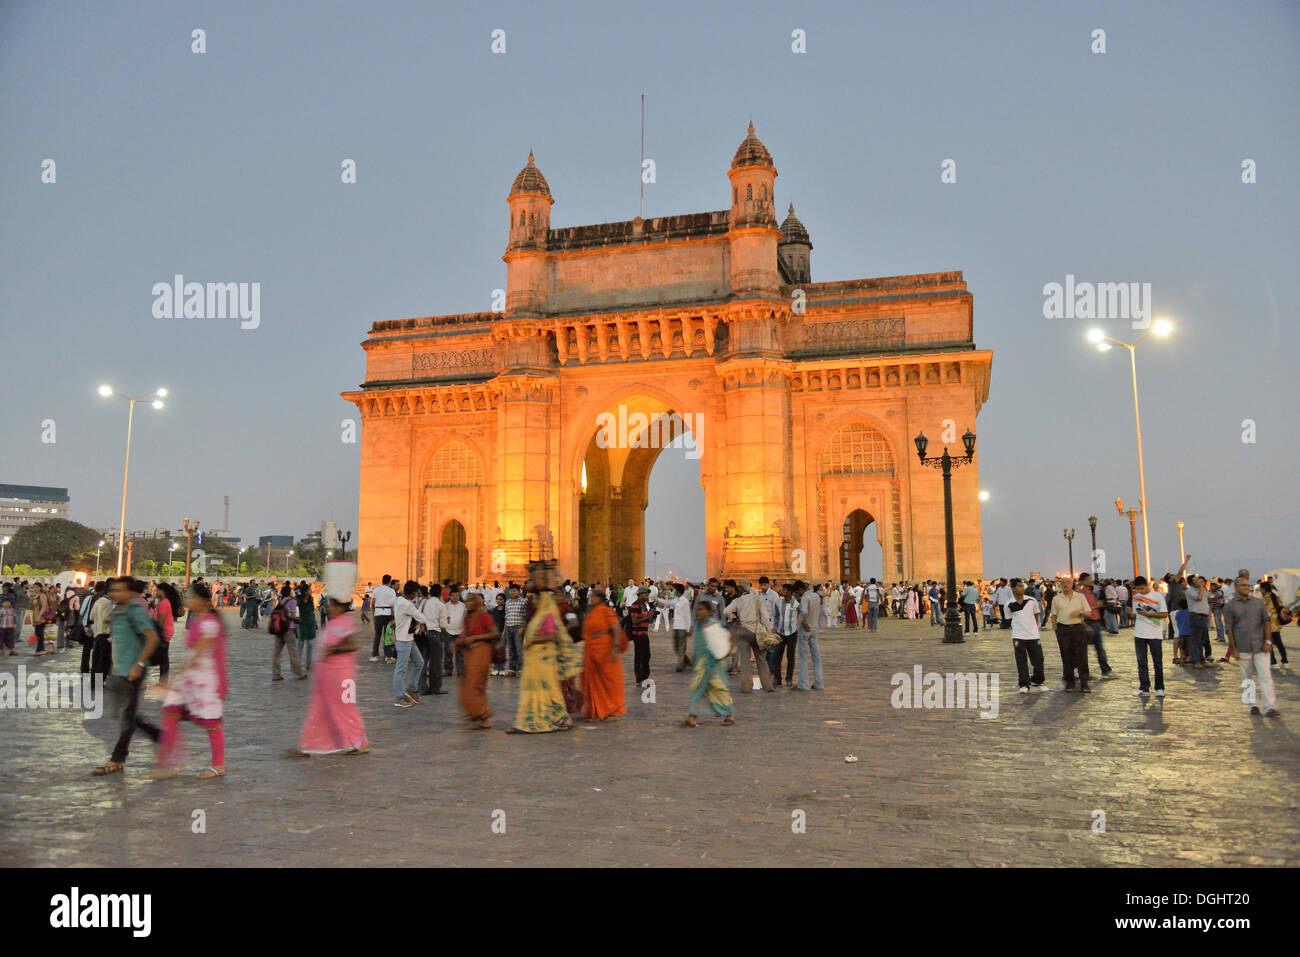 Gateway of India monumento, punto di riferimento di Mumbai, Mumbai, Maharashtra, India Immagini Stock